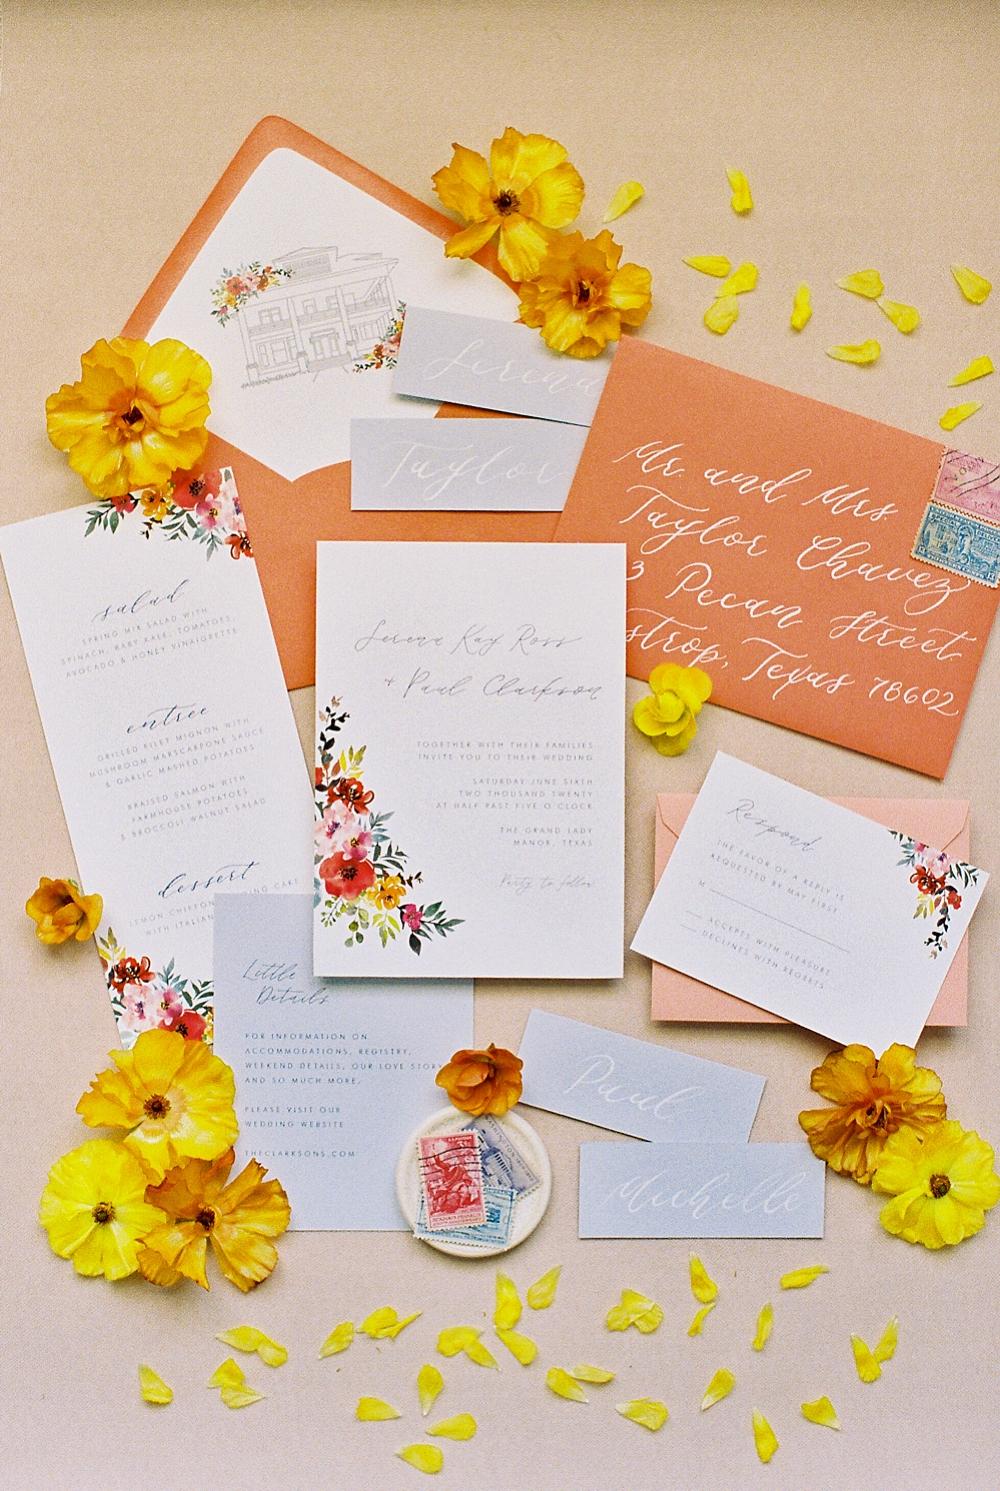 Kristin-La-Voie-Photography-Austin-Wedding-Photographer-the-grand-lady-2-2